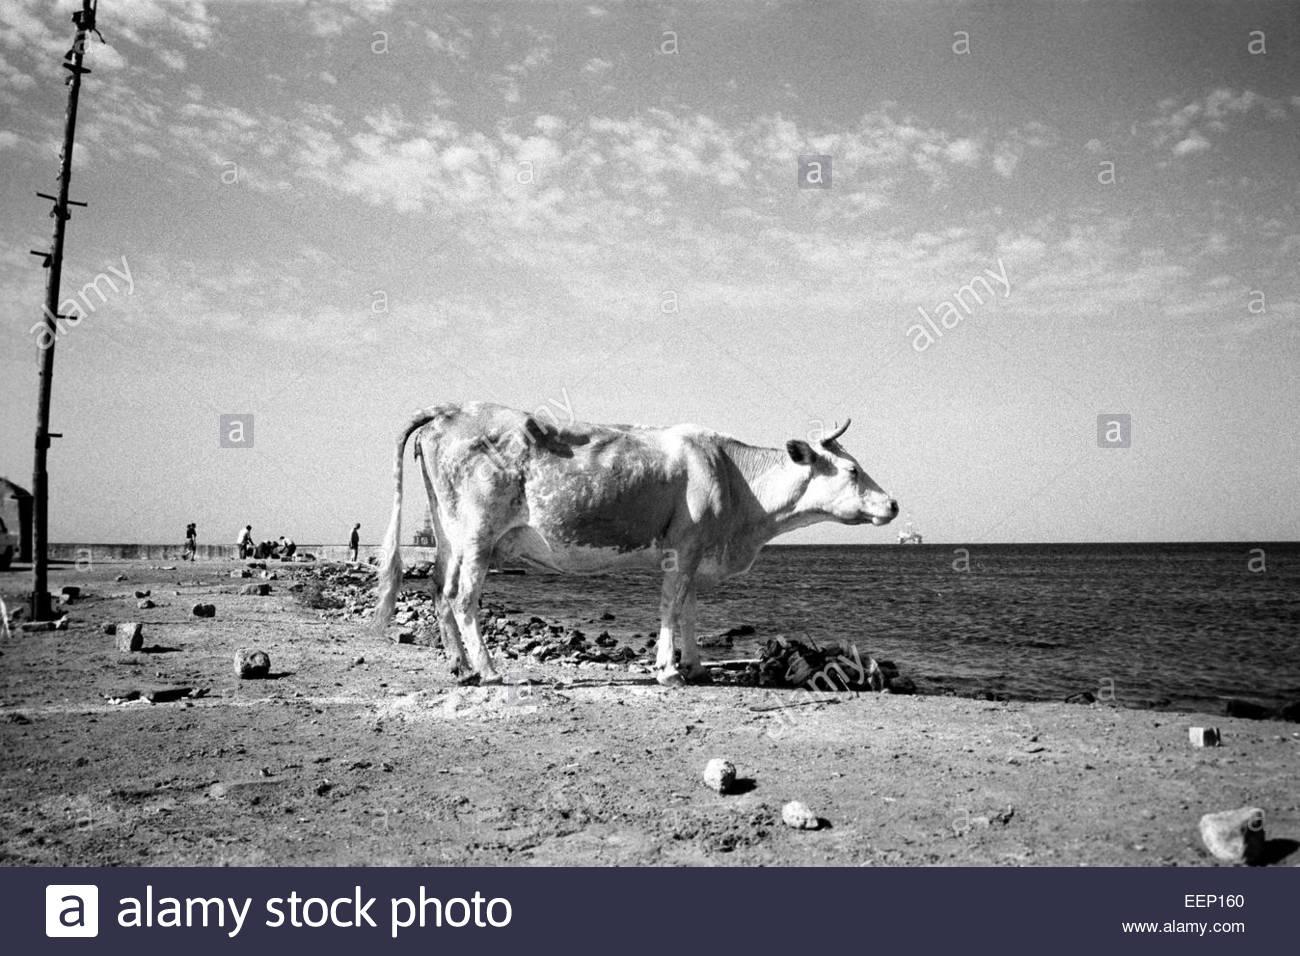 A cow and an oil platform on Caspien sea, Baku, Azerbaijan. Stock Photo